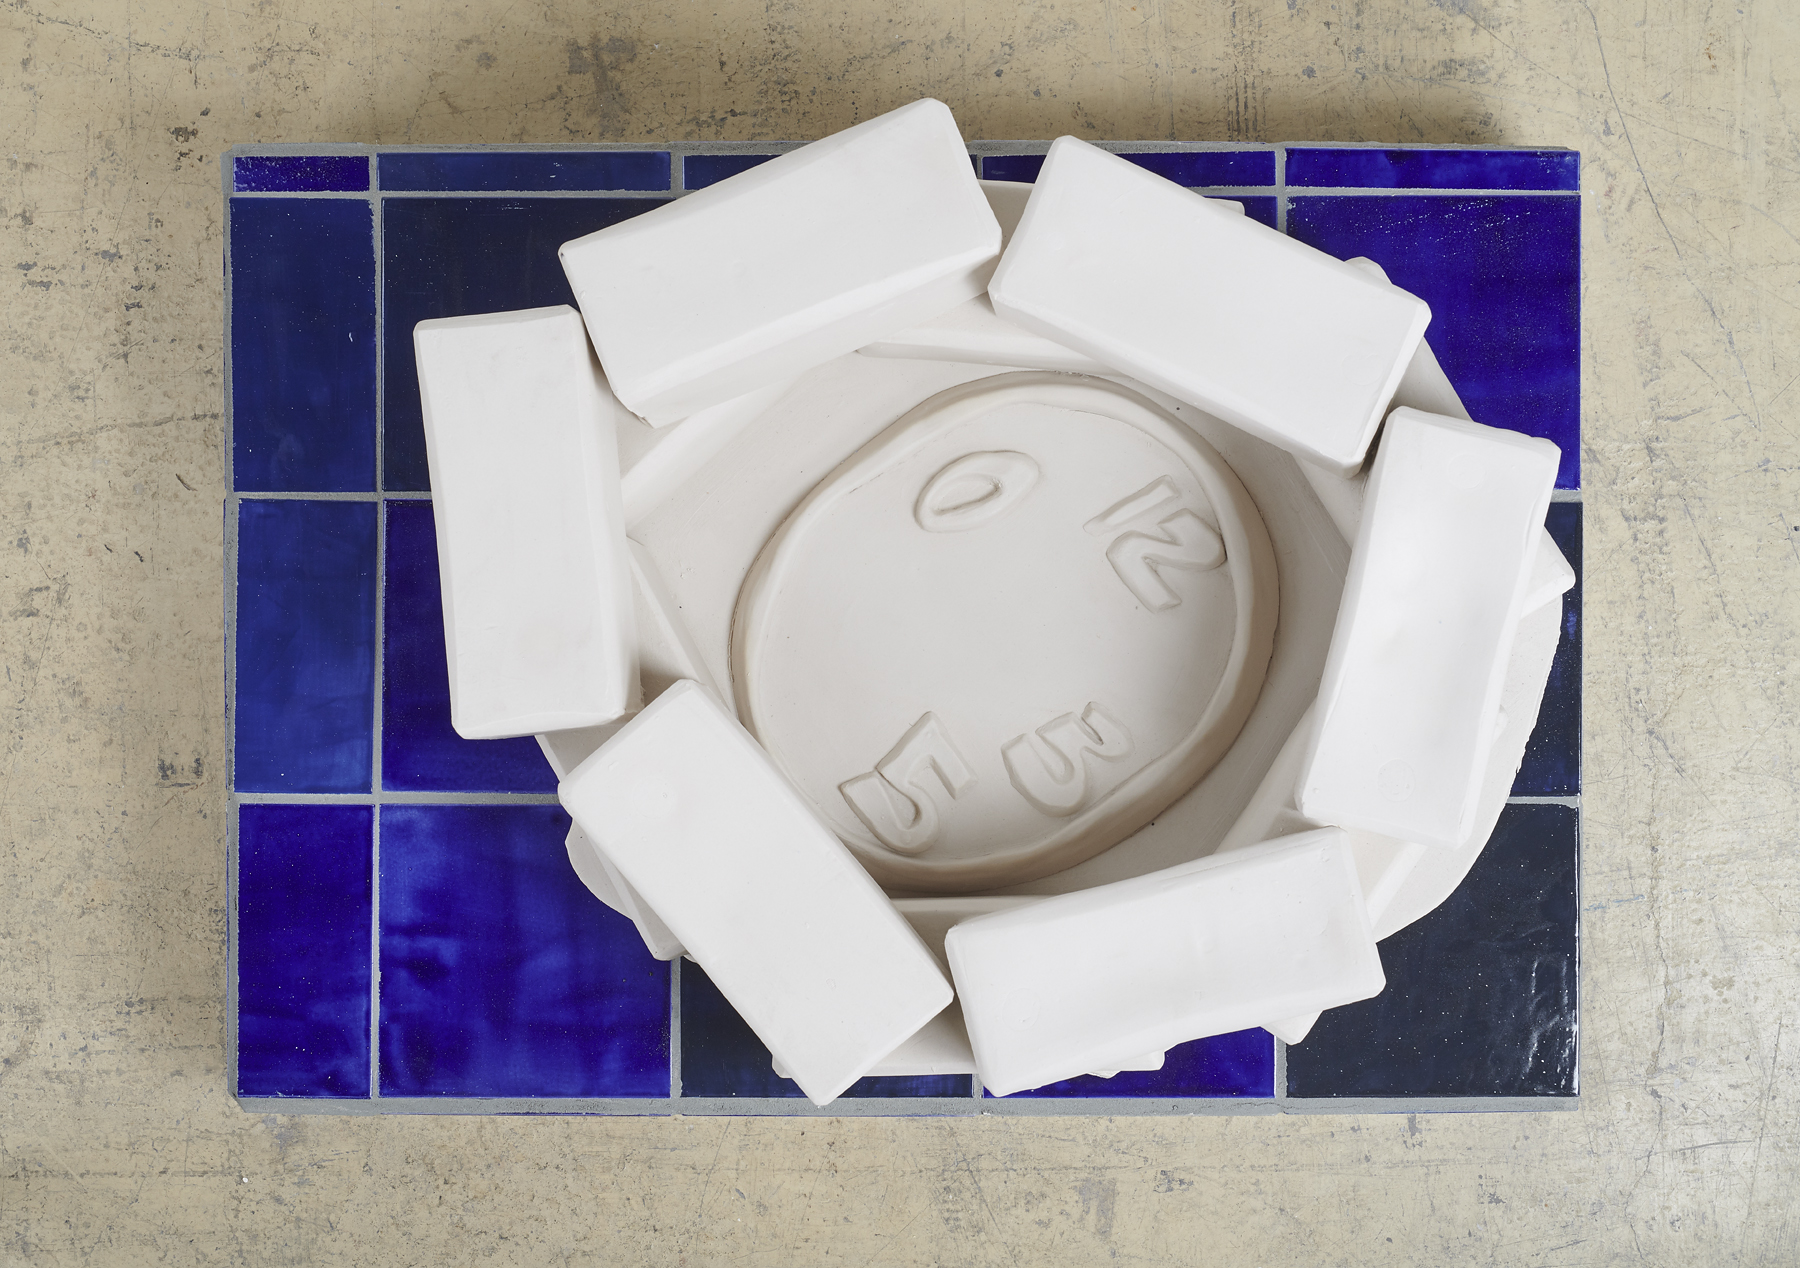 Woody De Othello, Ceramic